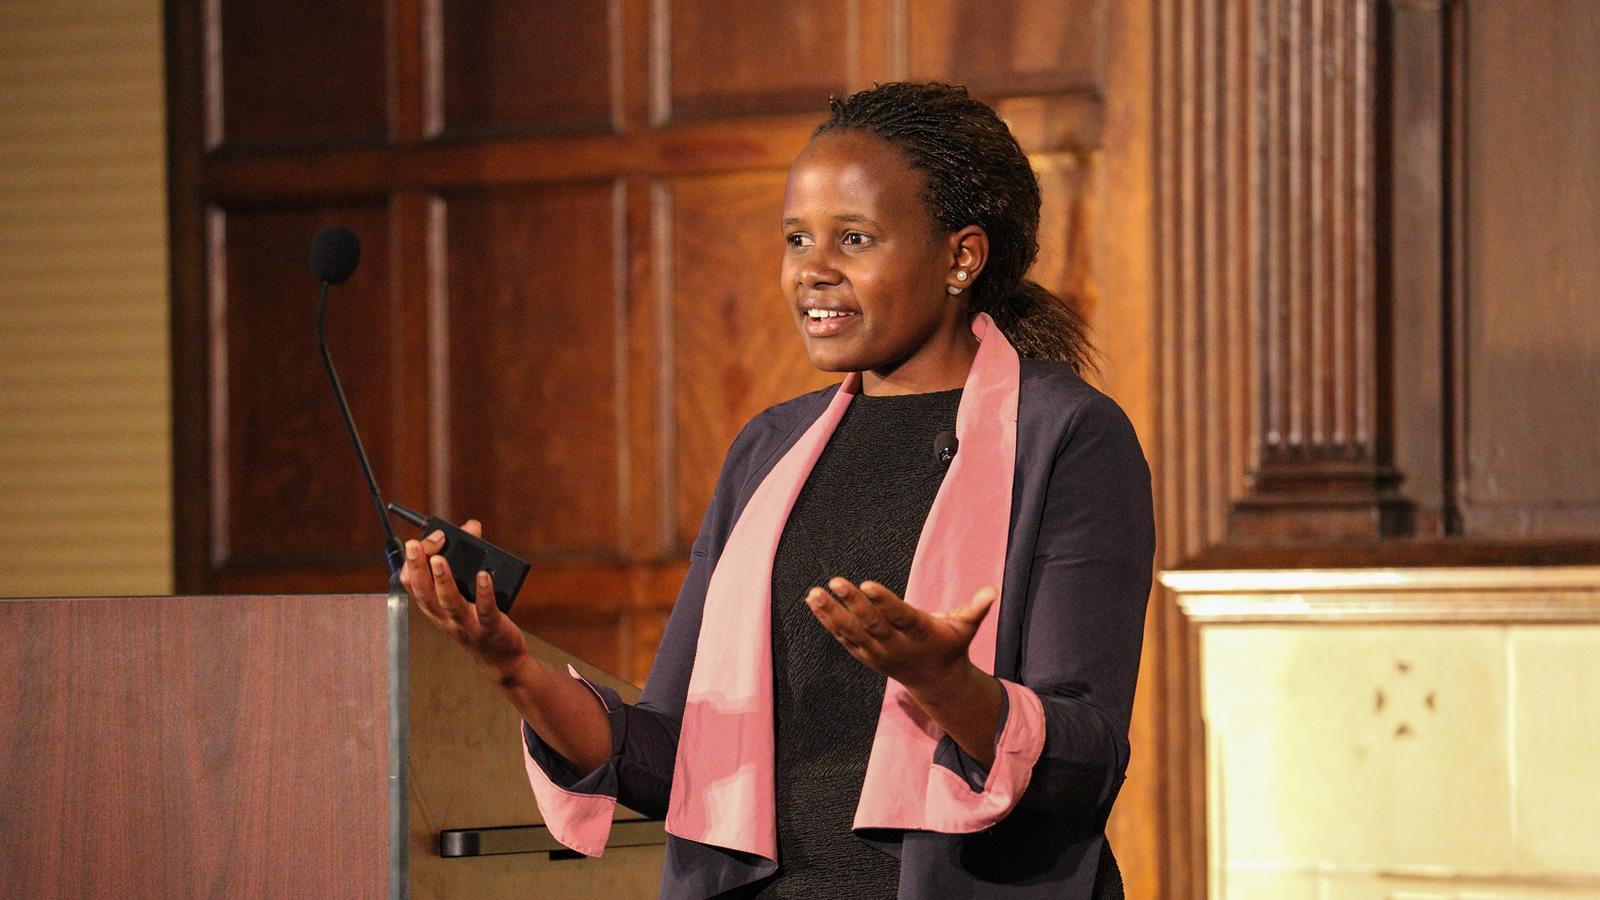 Dr. Mireille Twaiyigira tells her story.